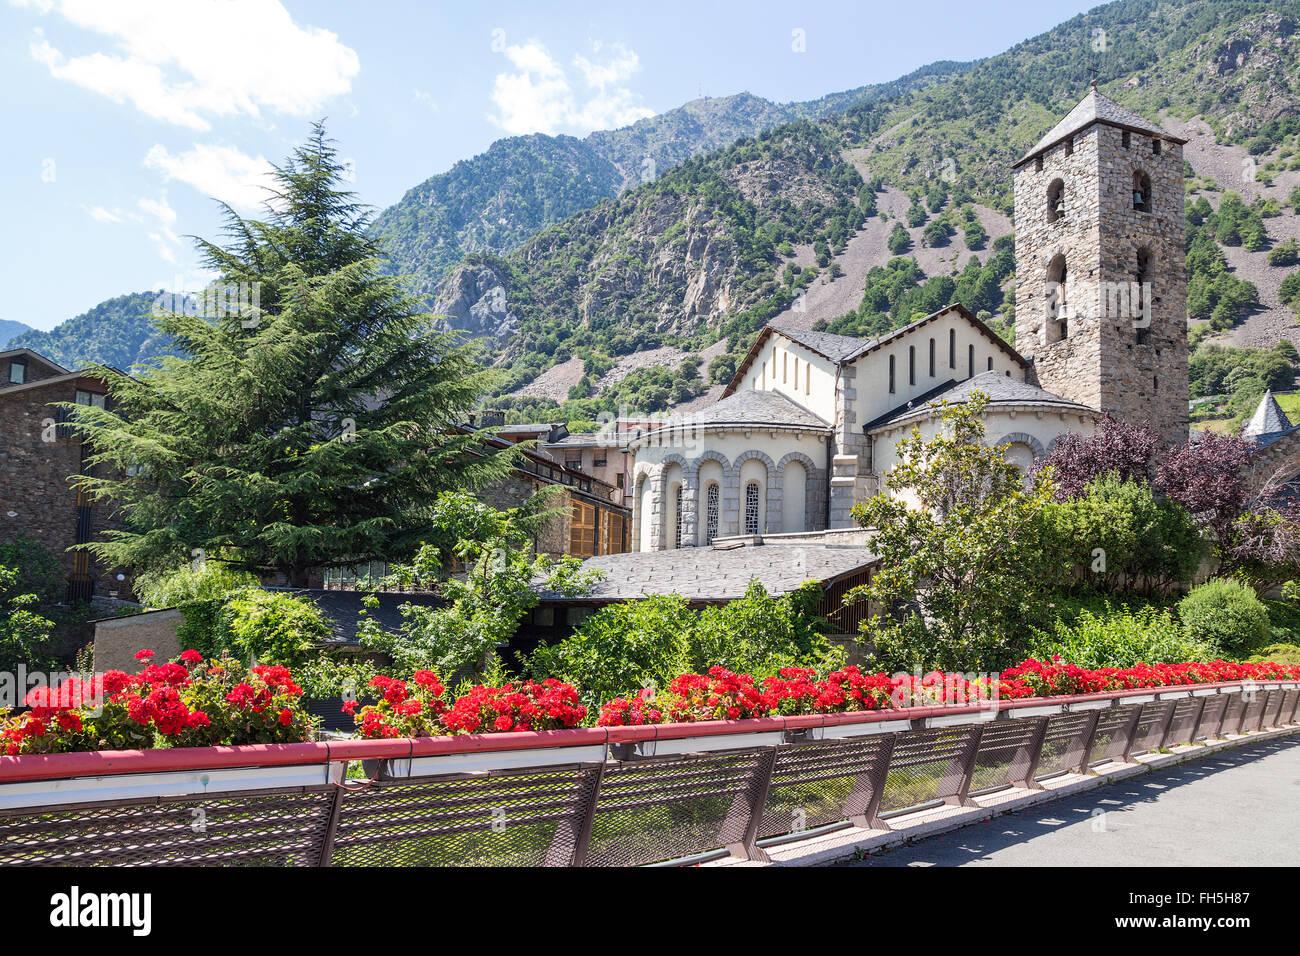 Beautiful view of Andorra La Vella, capital of Andorra. - Stock Image